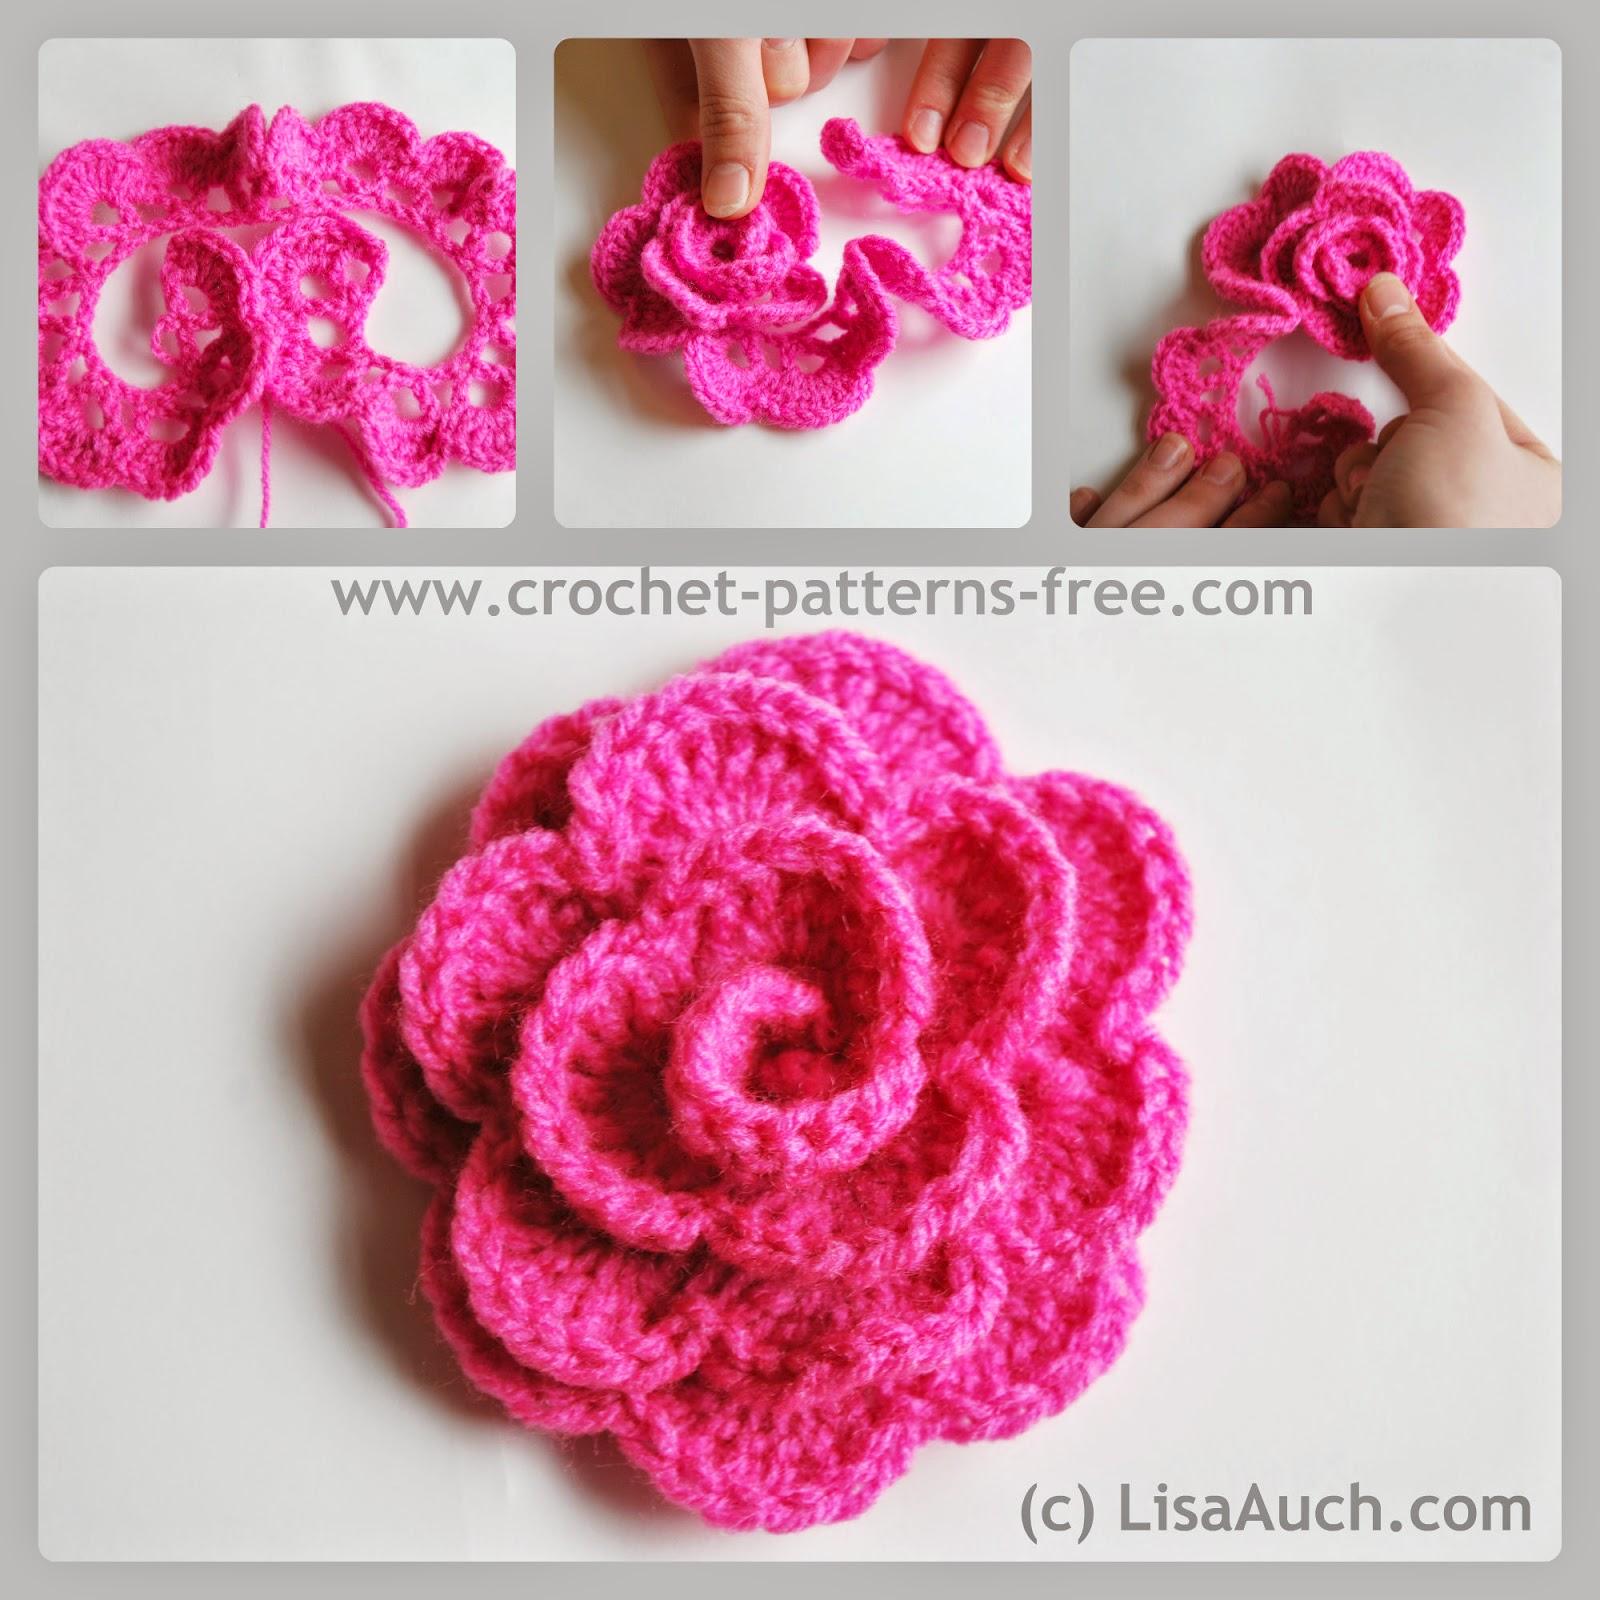 Free crochet flower patterns-crochet rose